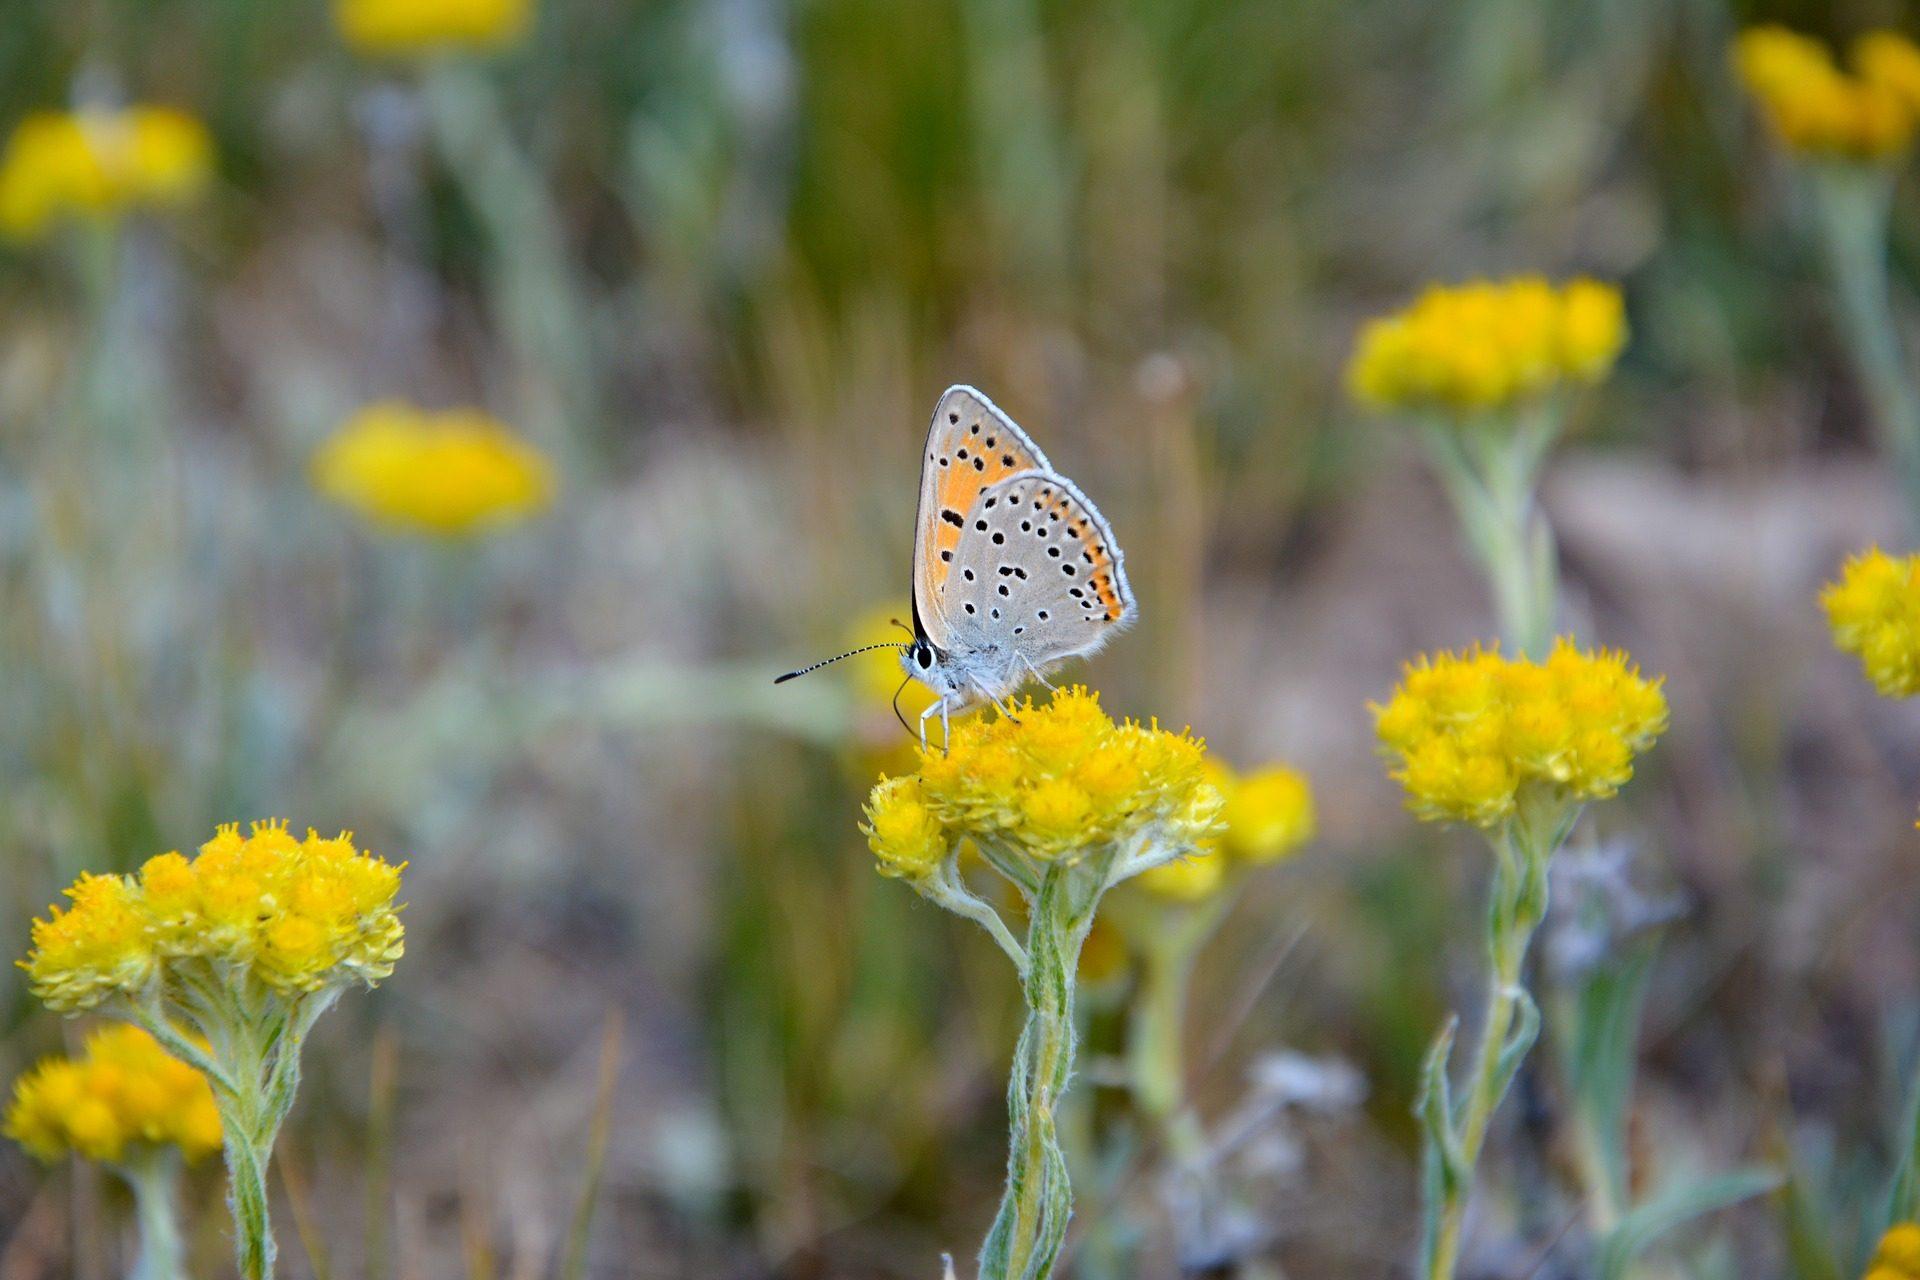 flor, mariposa, insecto, alas, colorido - Fondos de Pantalla HD - professor-falken.com